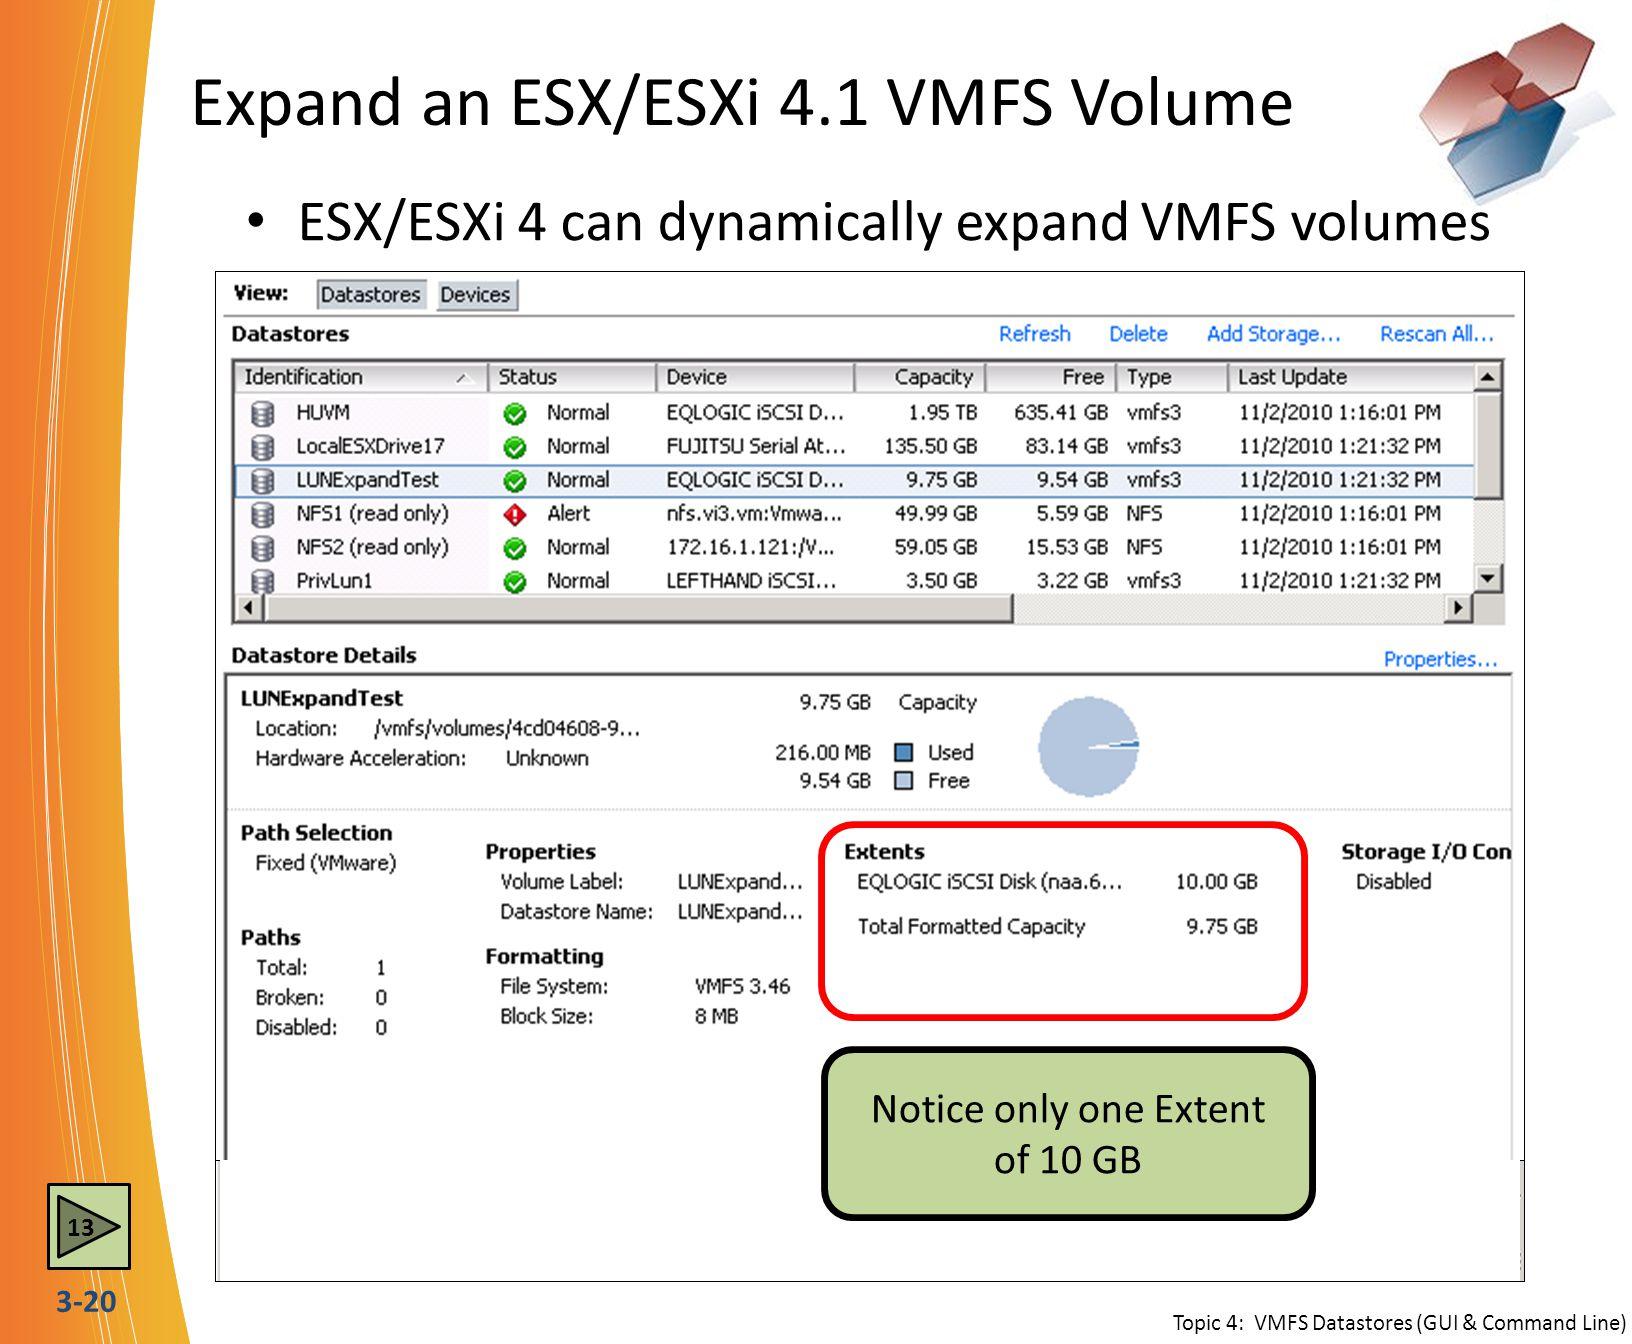 Expand an ESX/ESXi 4.1 VMFS Volume